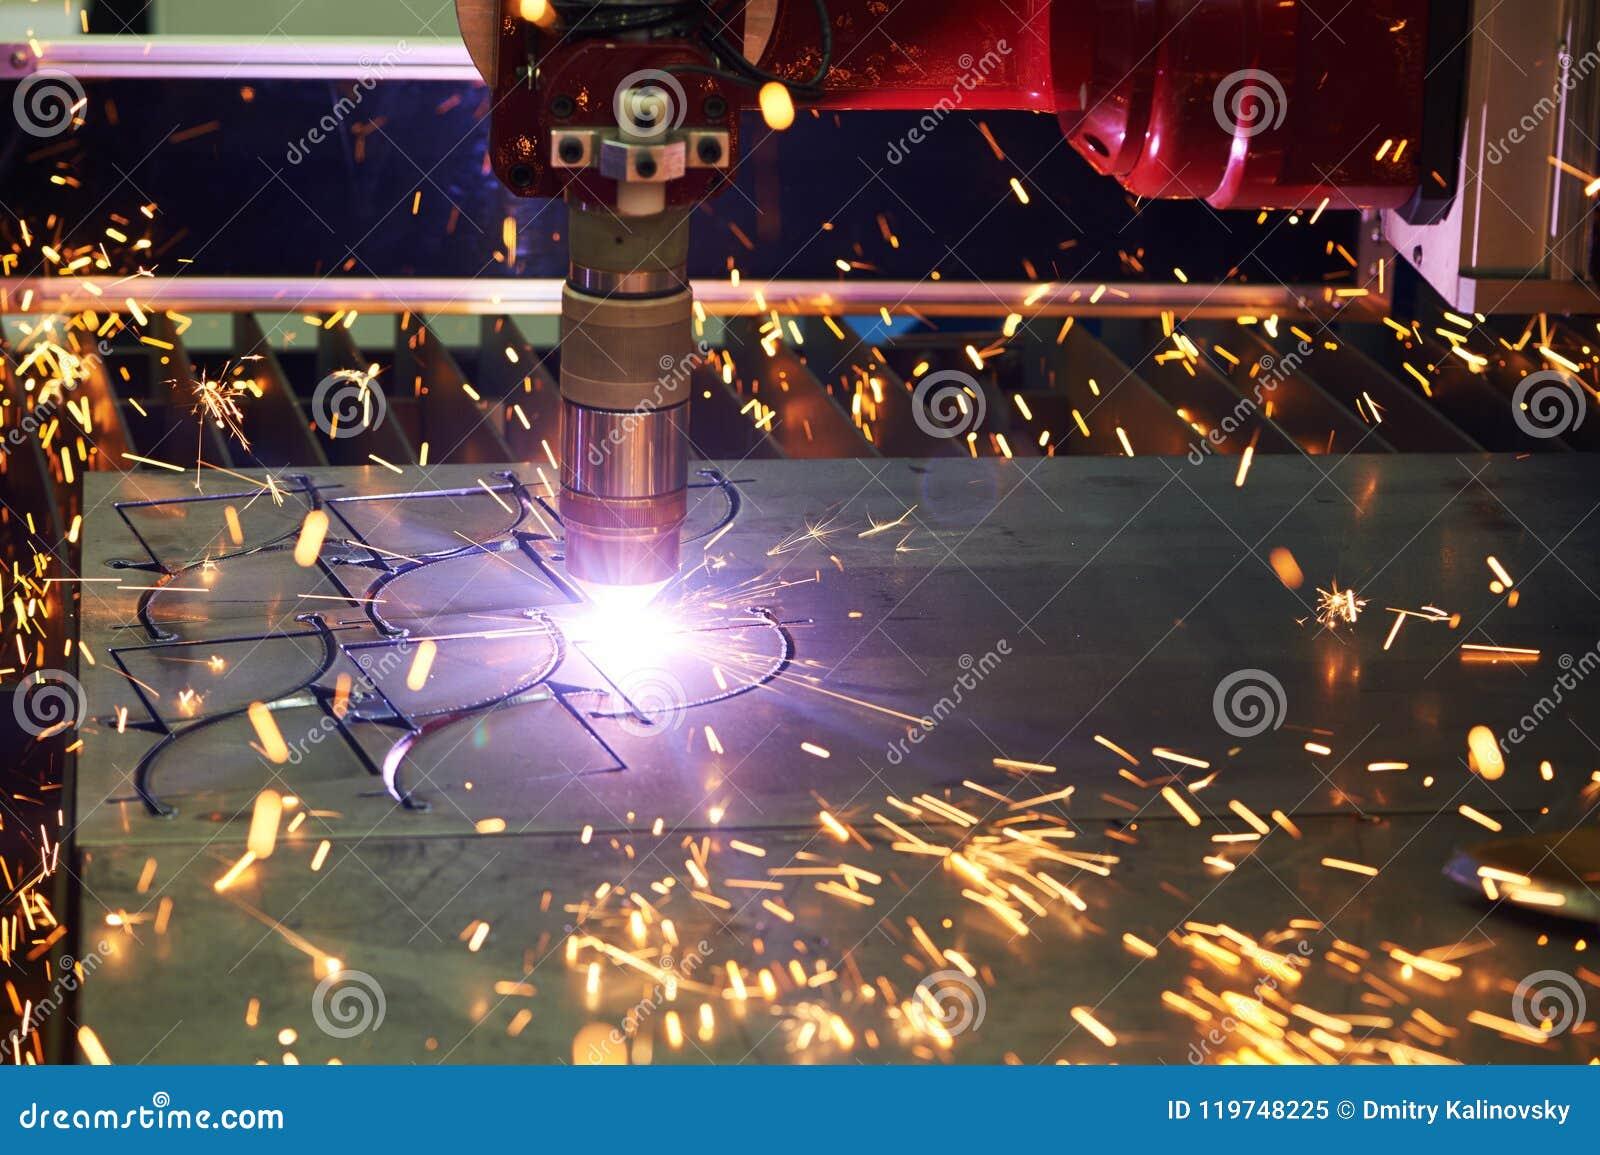 Tecnologia do corte do laser ou do plasma da chapa metálica lisa